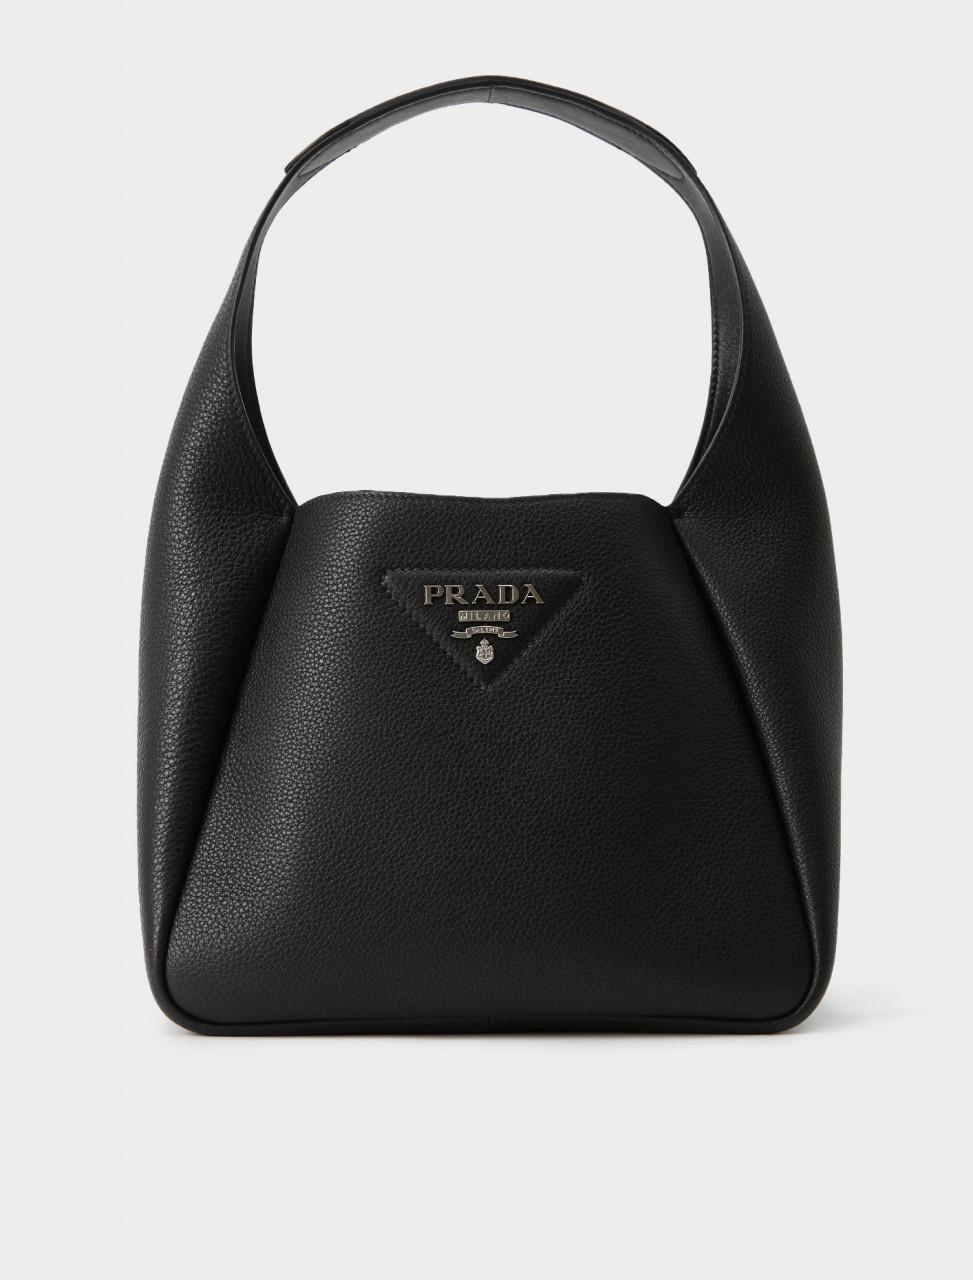 1BC127-2BBE-F0002 Prada Leather Bucket Bag in Black